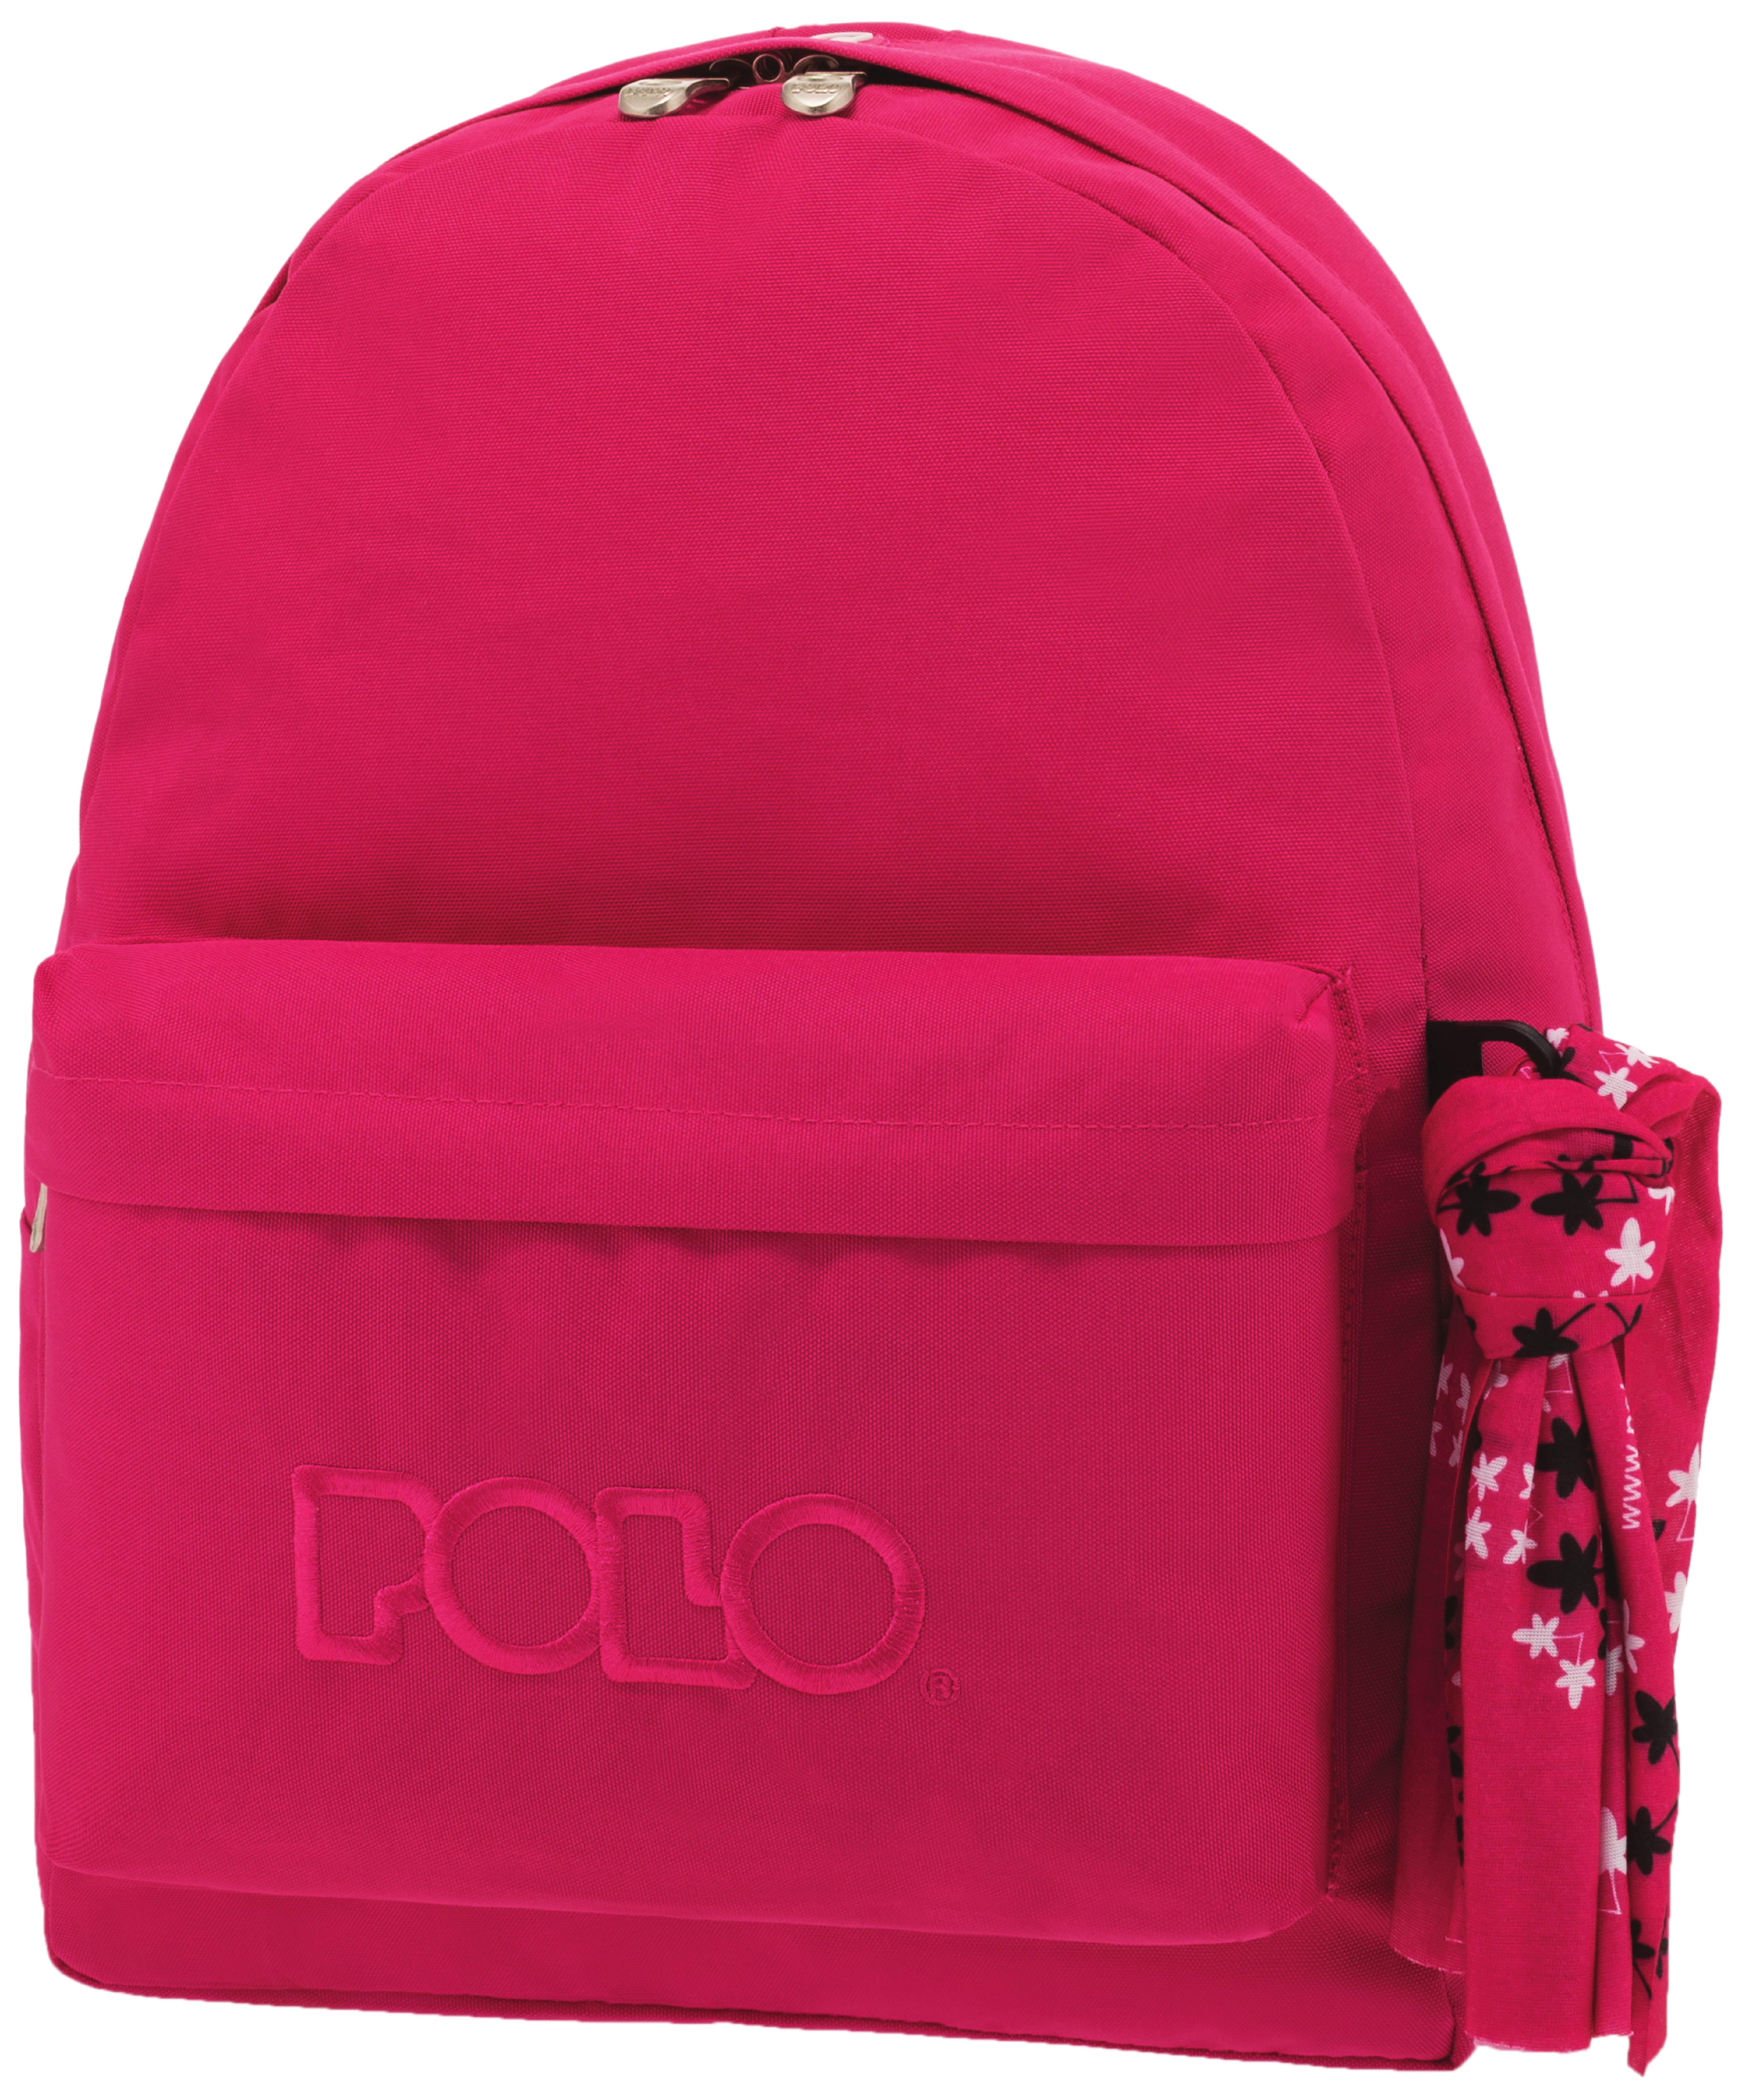 ea3f2ba1de Σακίδιο Πλάτης Polo Original Backpack - 9-01-135-29 - Lexicon Shop